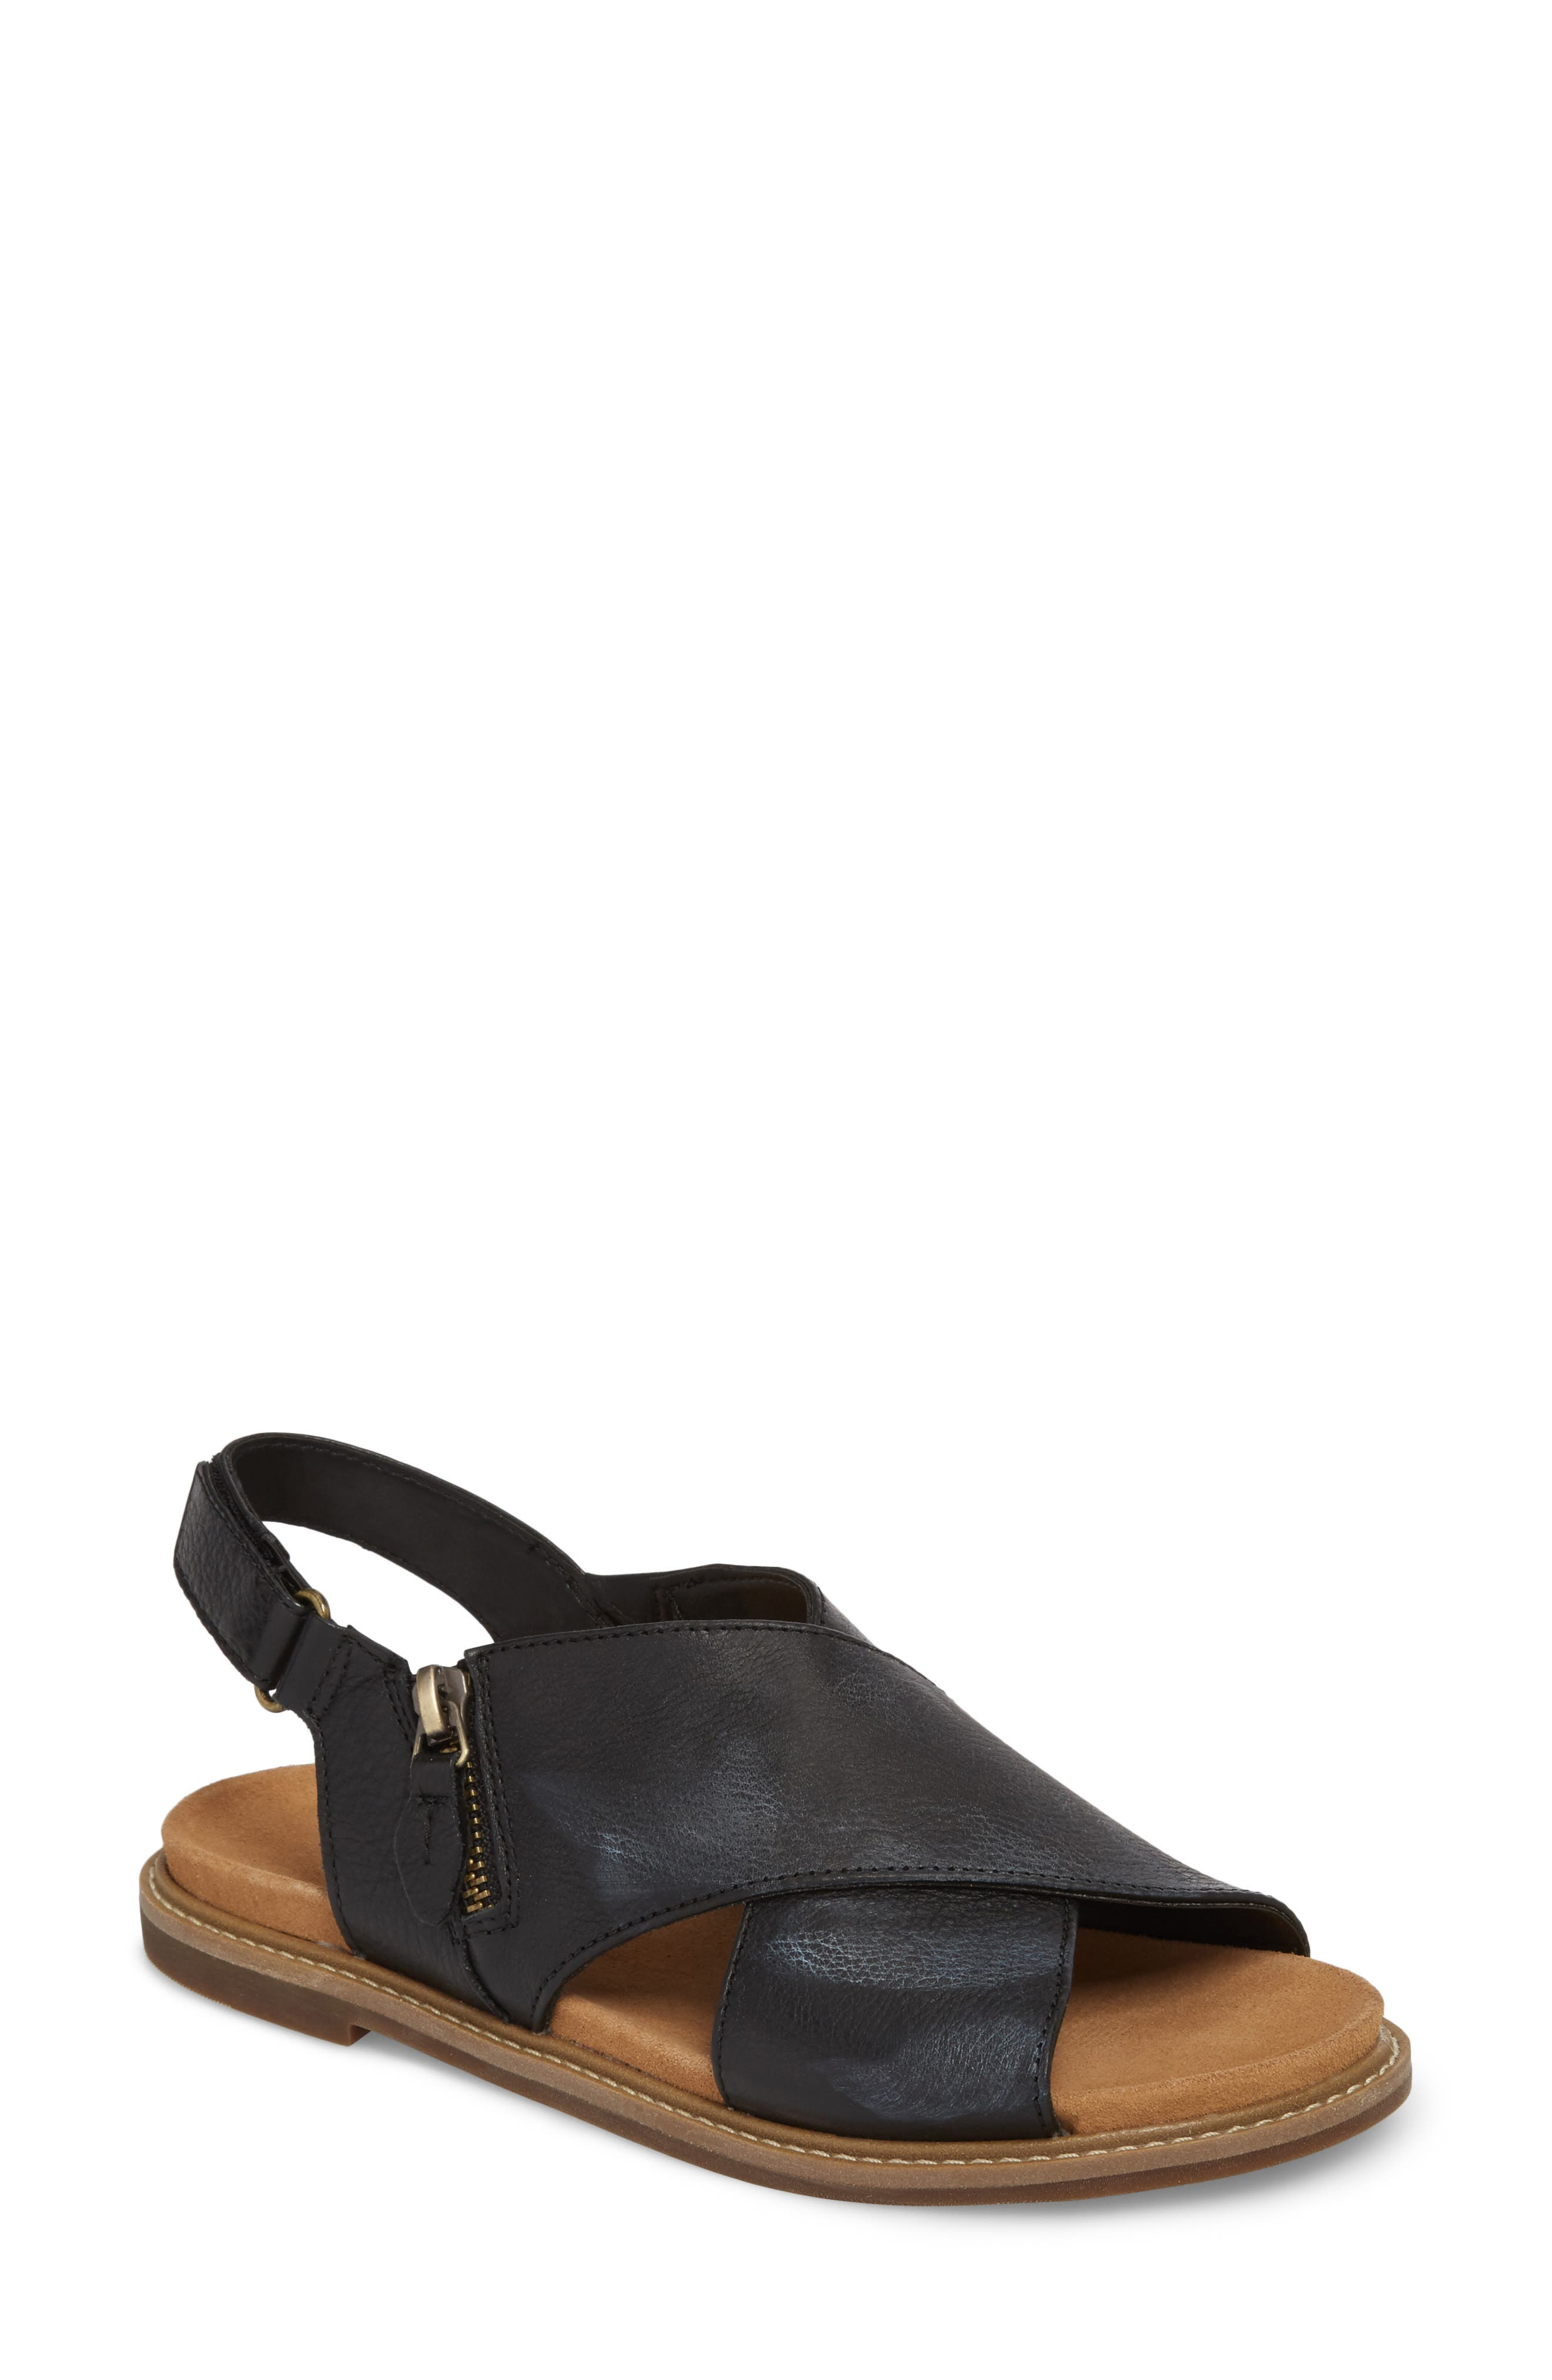 Corsio Calm Sandal,                             Main thumbnail 1, color,                             003